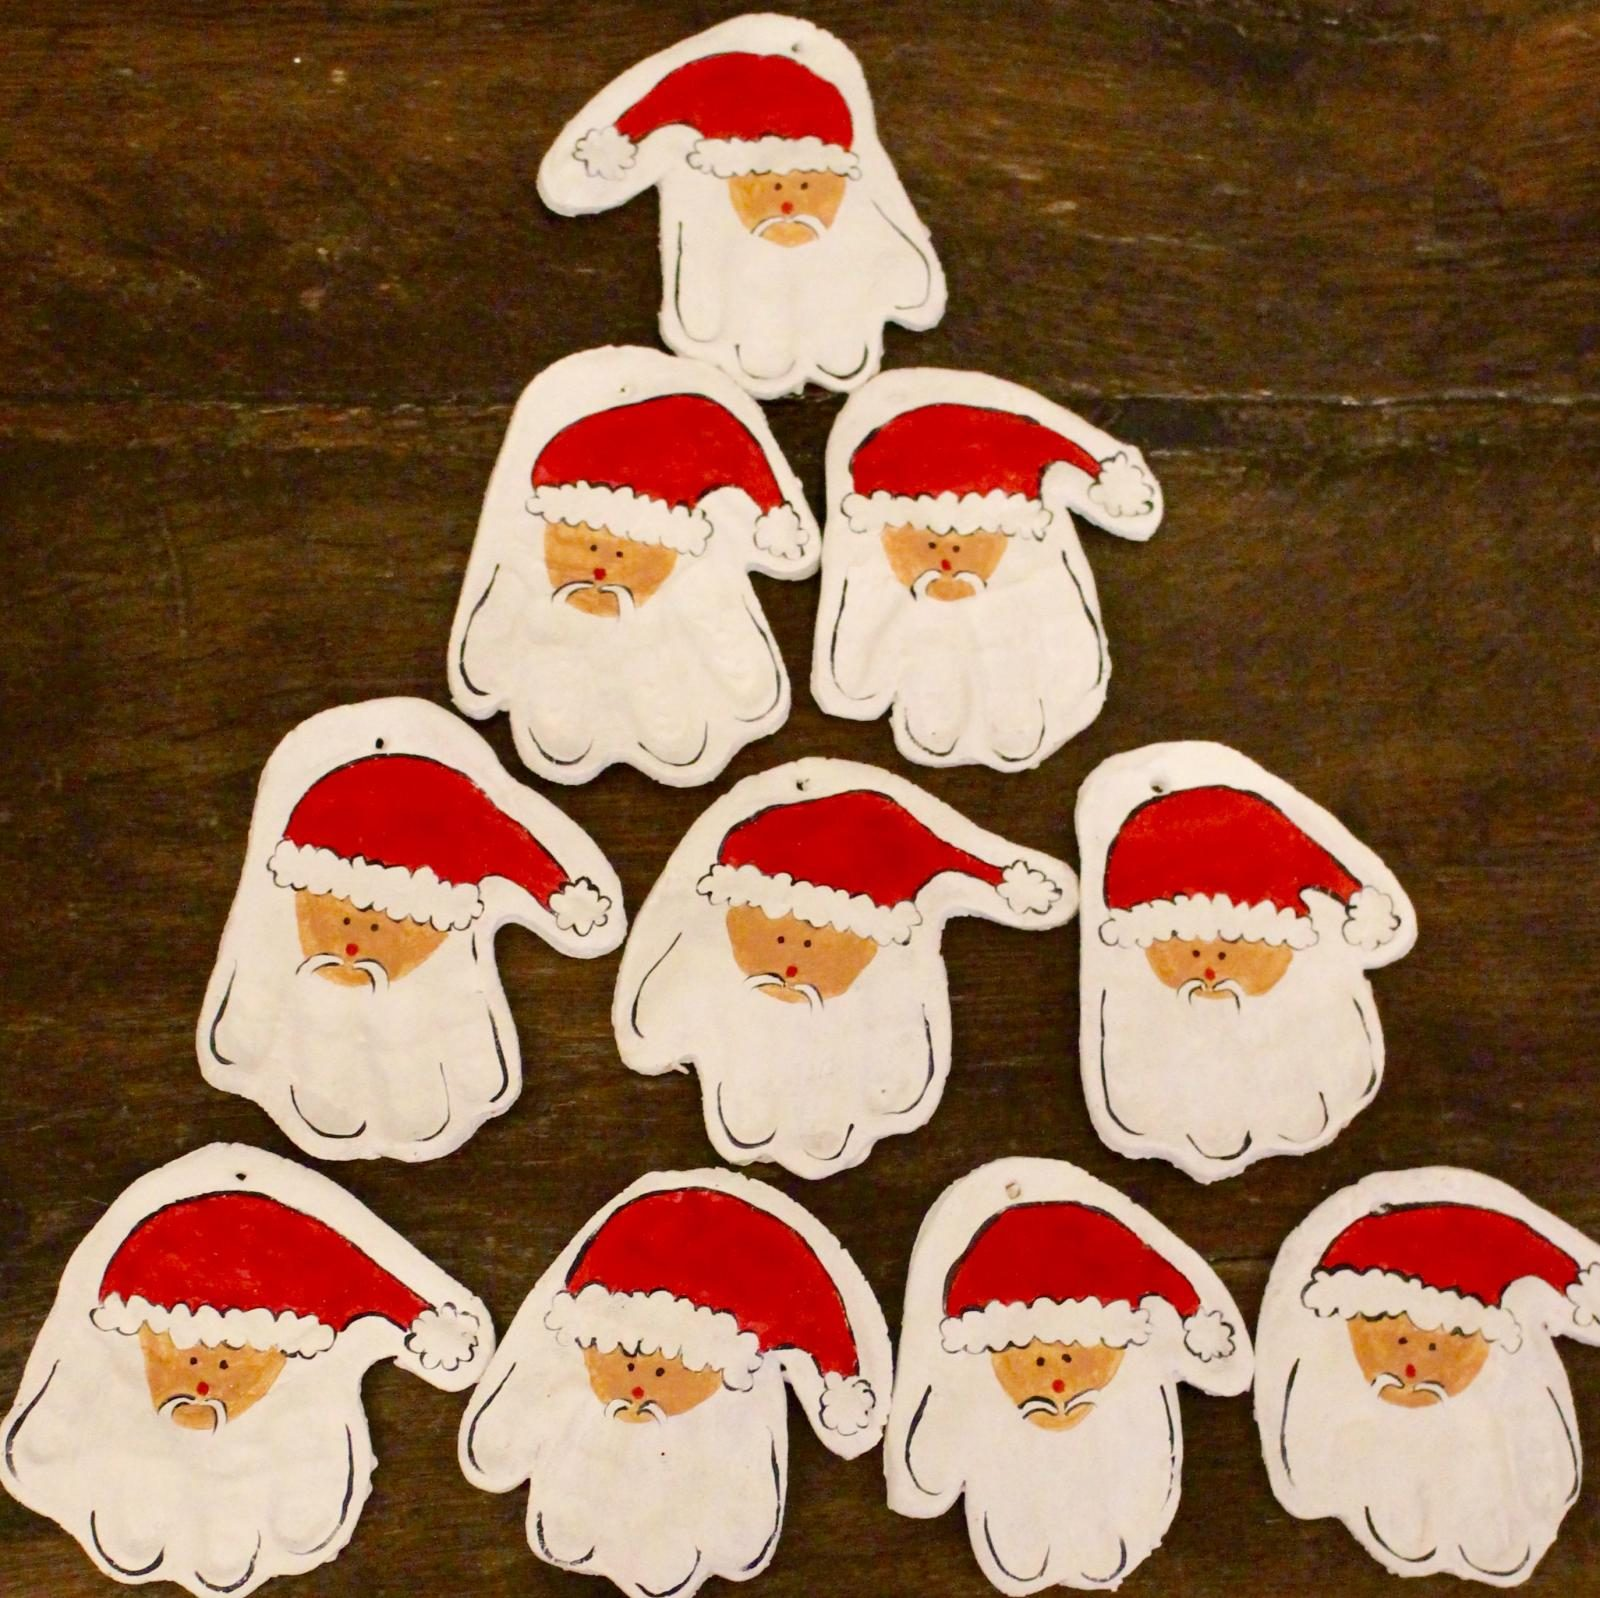 CHRISTMAS CRAFTS – Salt Dough Father Christmas Handprint Decorations